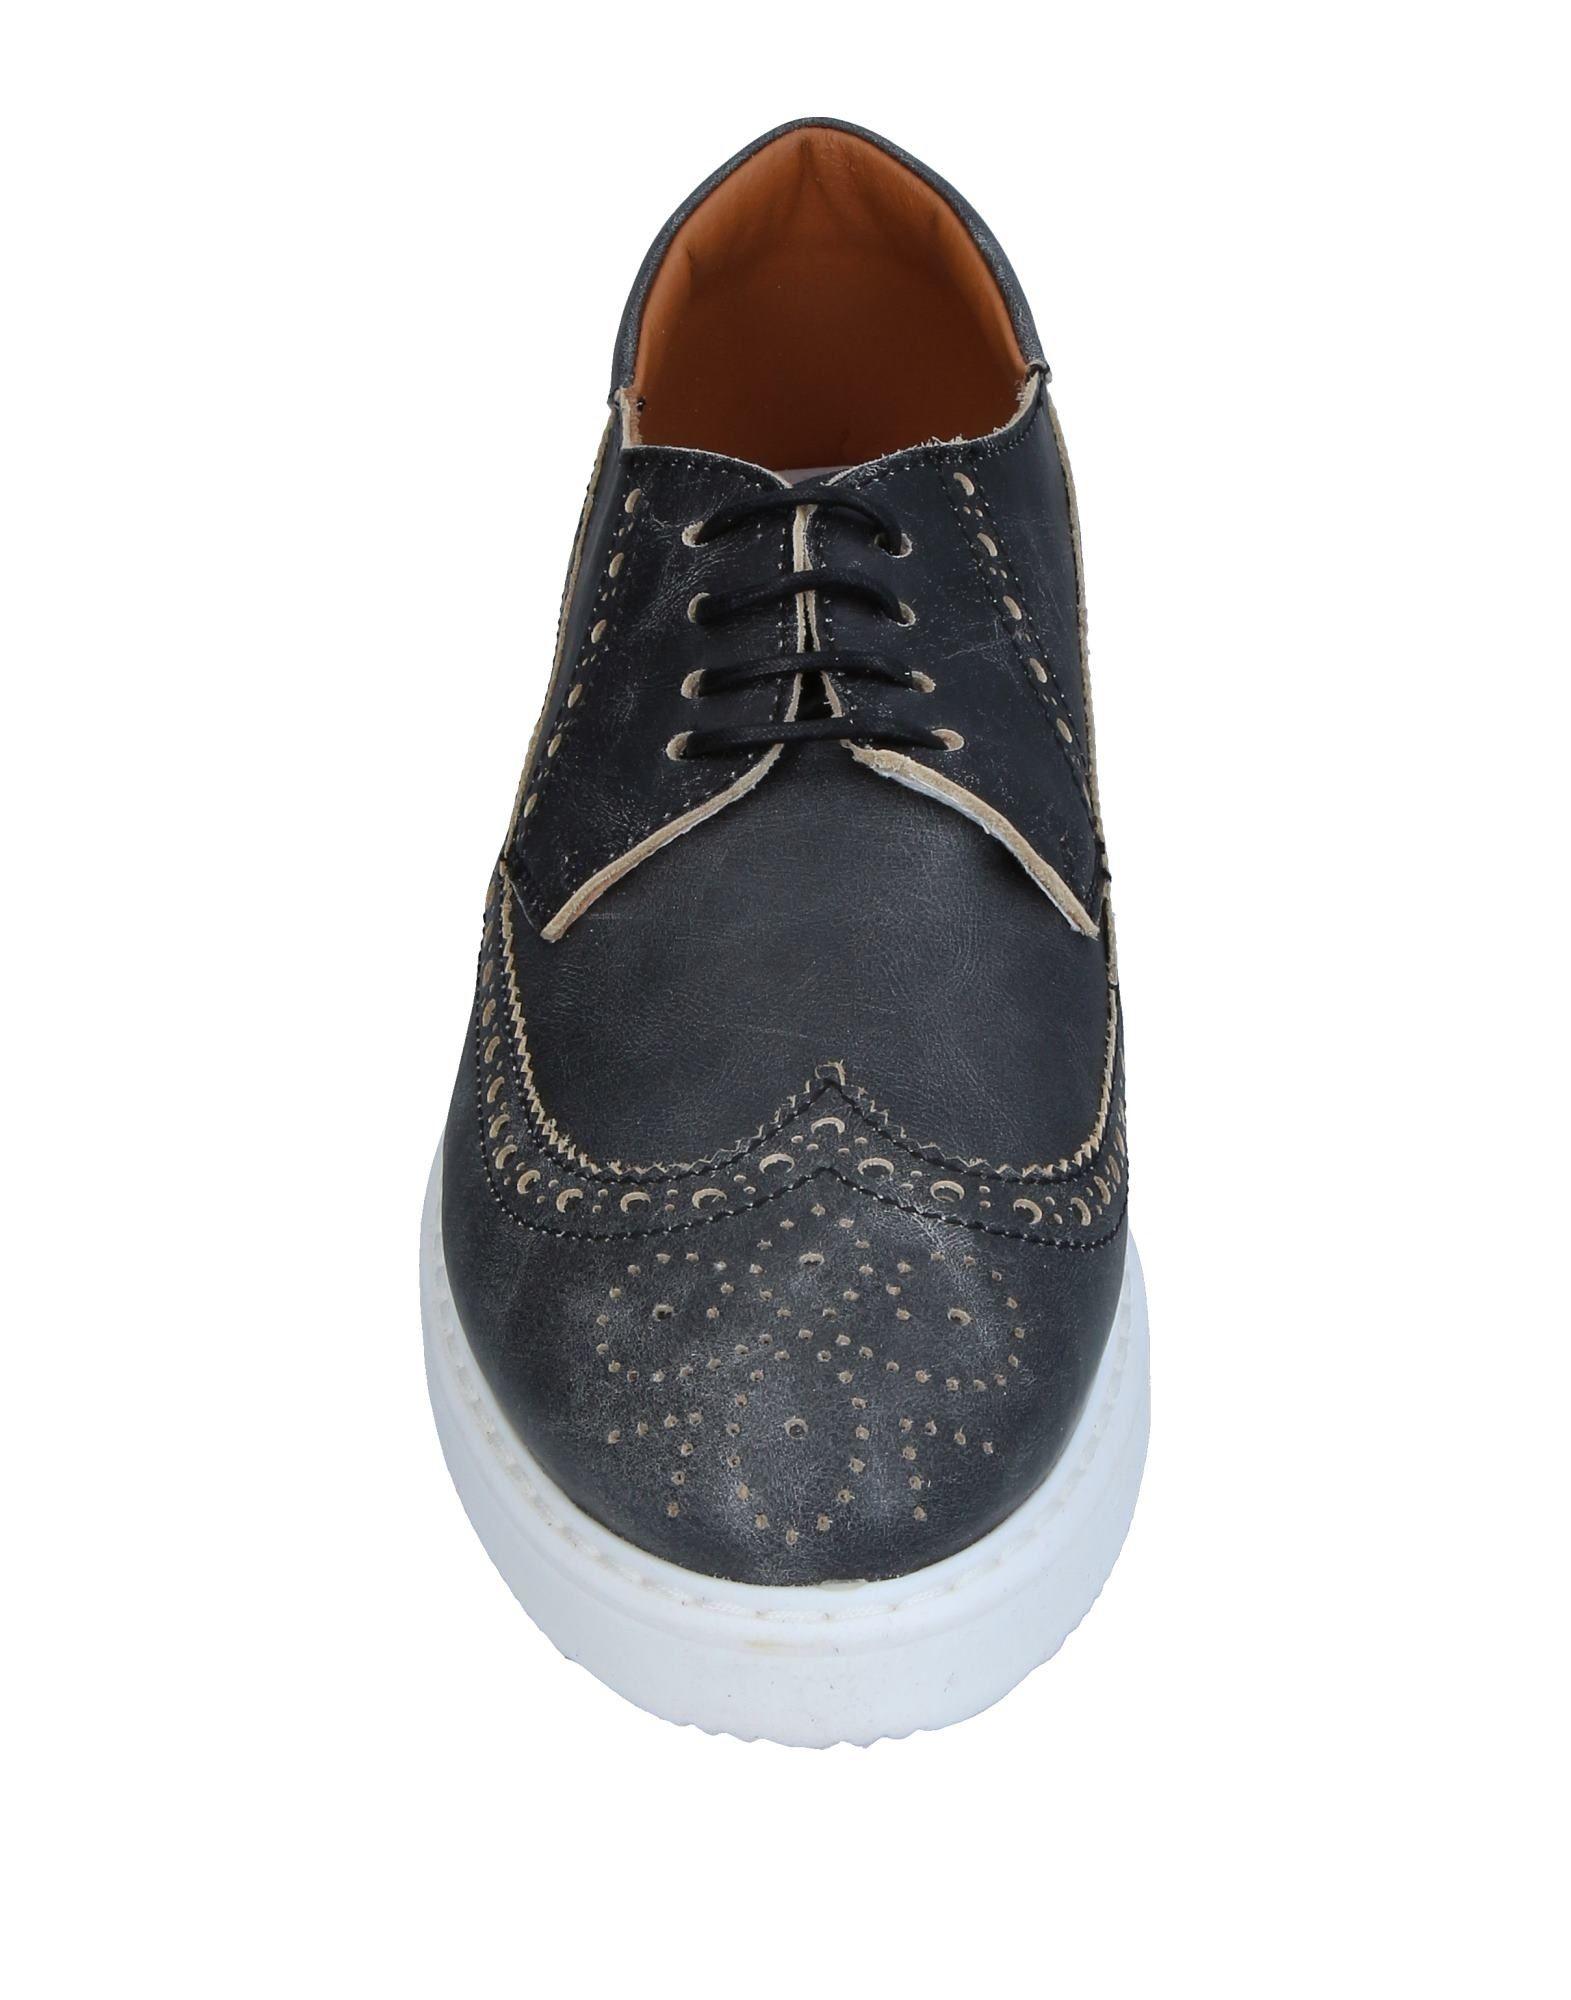 Rabatt  echte Schuhe Primabase Schnürschuhe Herren  Rabatt 11333077WT 876bc4